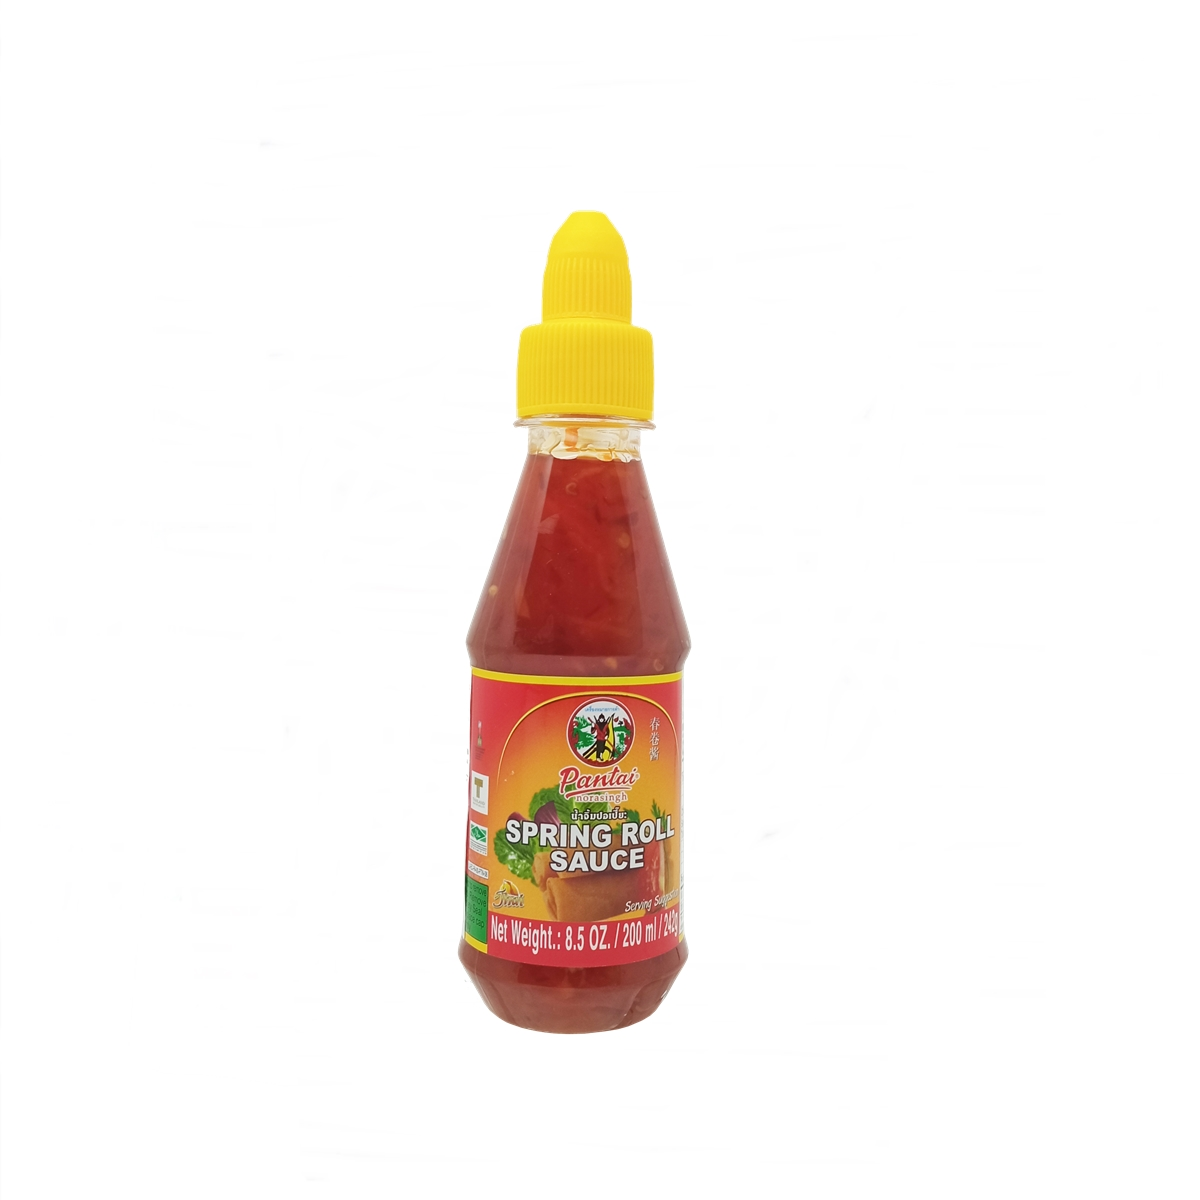 Molho Apimentado p/ Frango Sweet Chilli Sauce 200mL Pantai